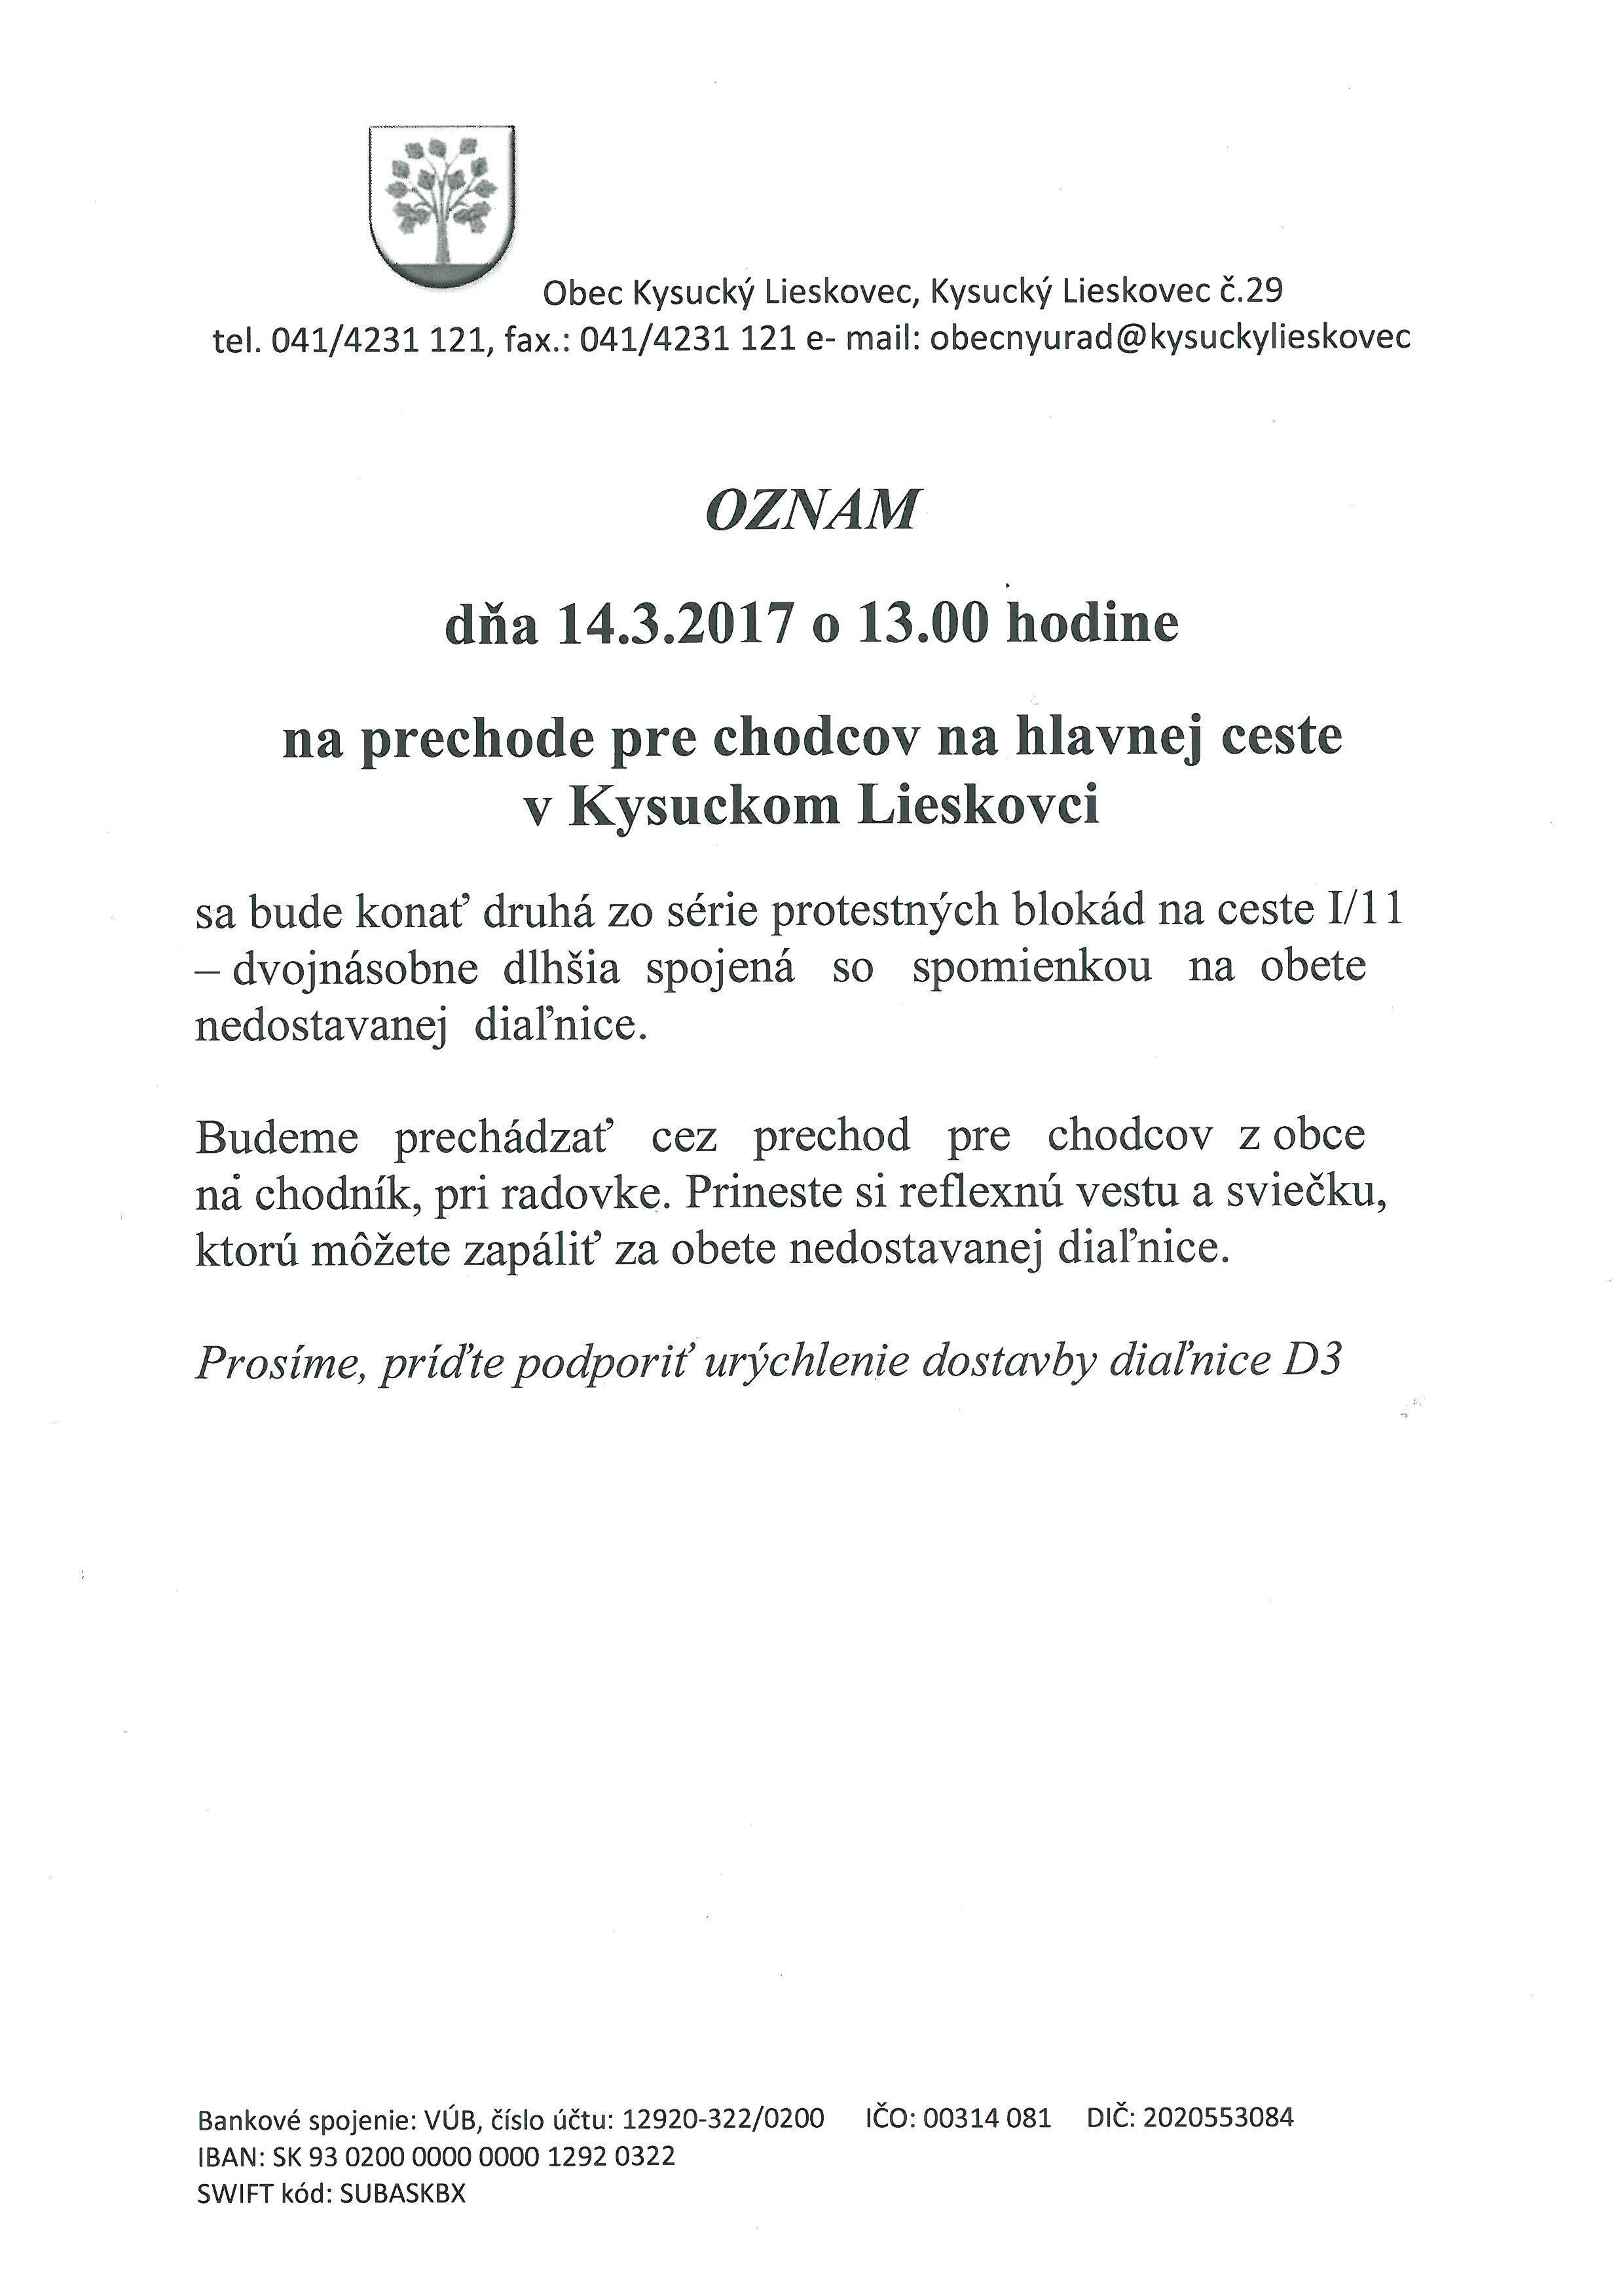 Protestná blokáda na ceste I/11